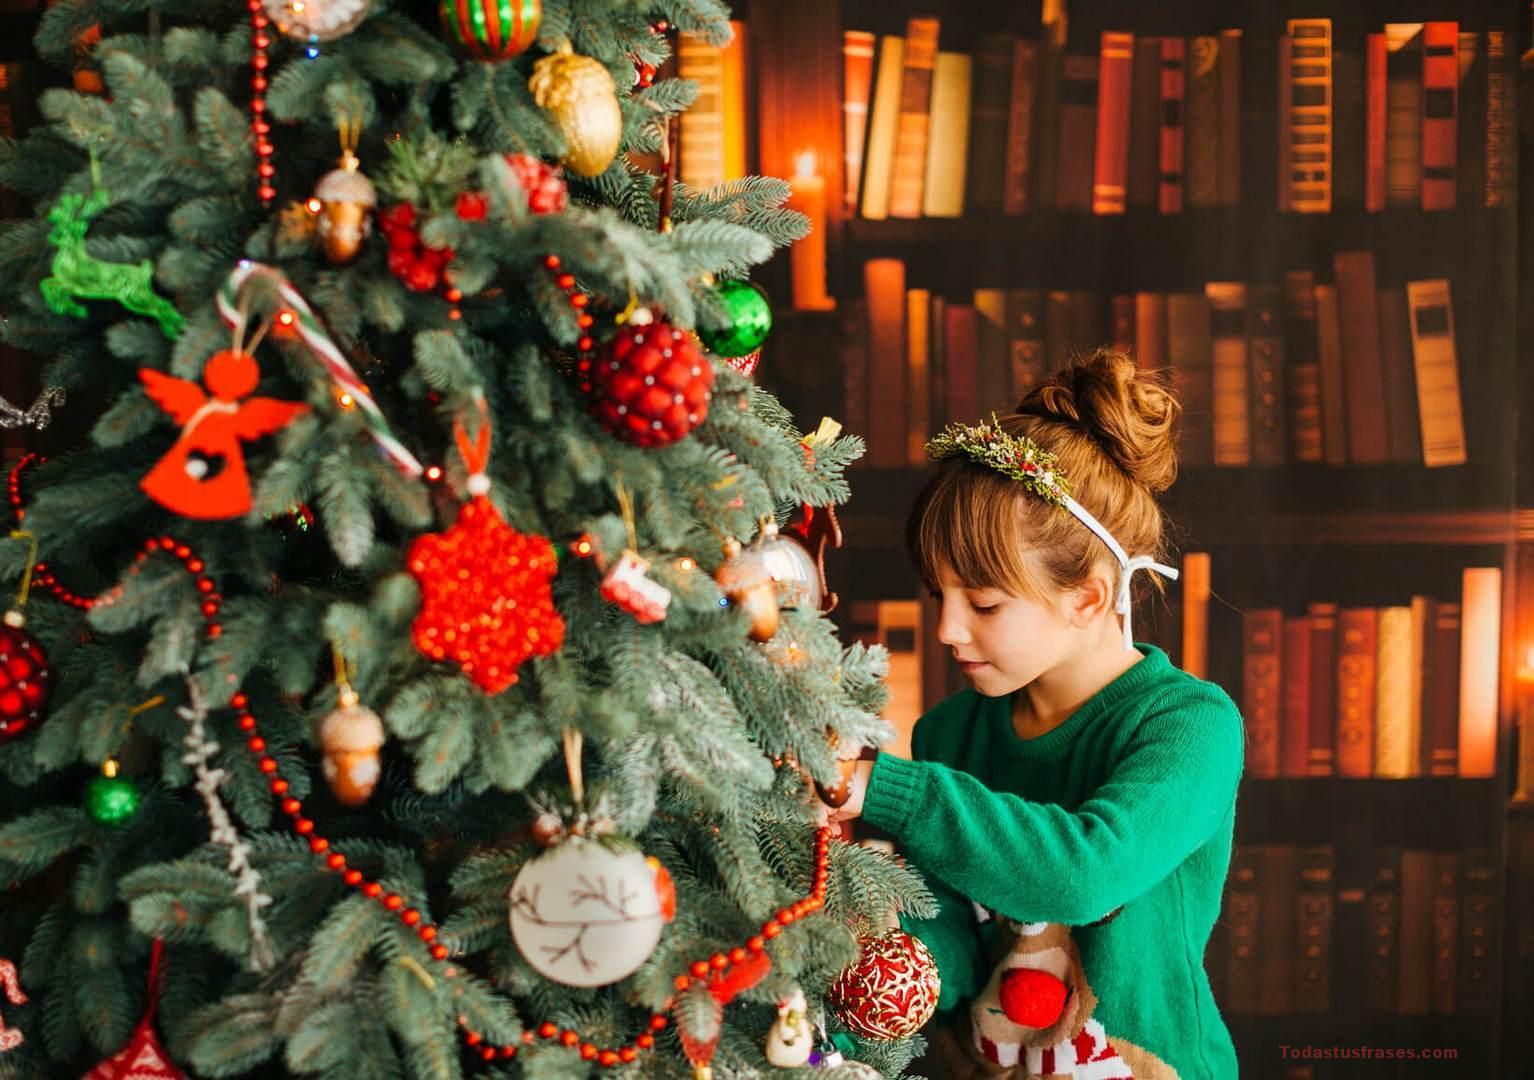 Fondos De Pantalla De Quikis: Fondos De Pantalla De Navidad